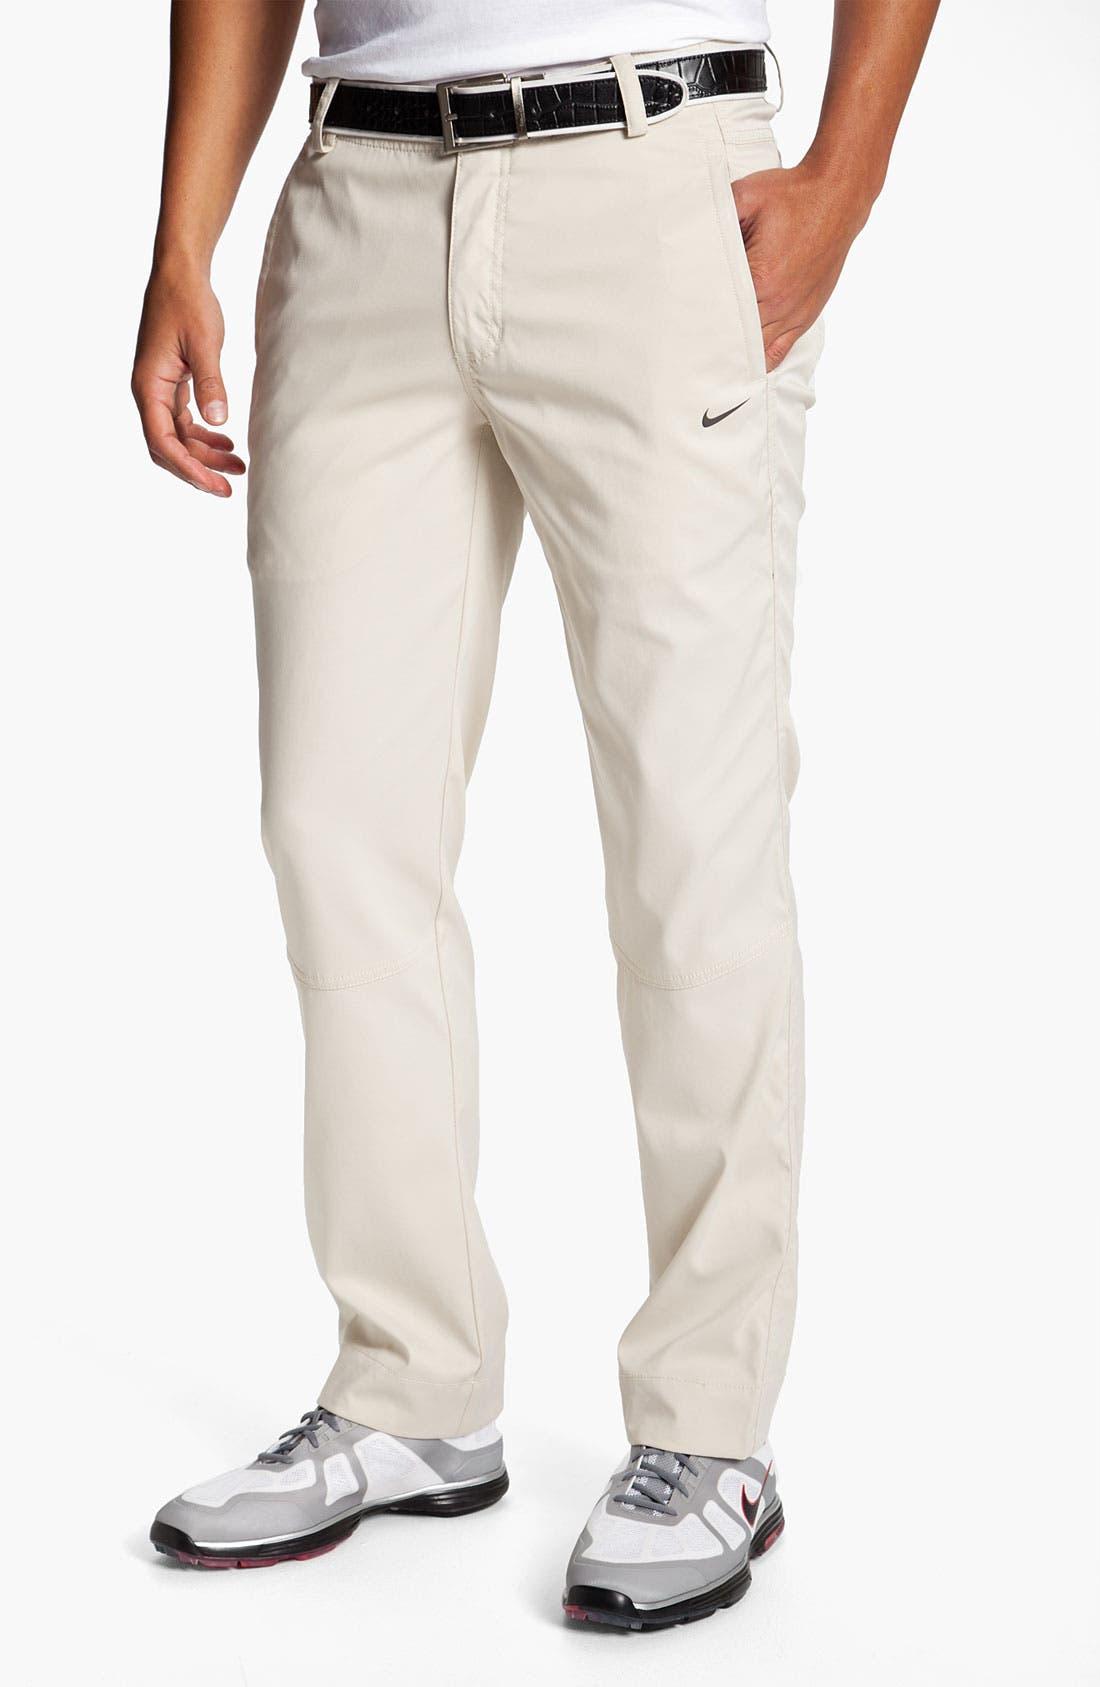 Main Image - Nike Golf 'Sport Novelty' Dri-FIT Golf Pants